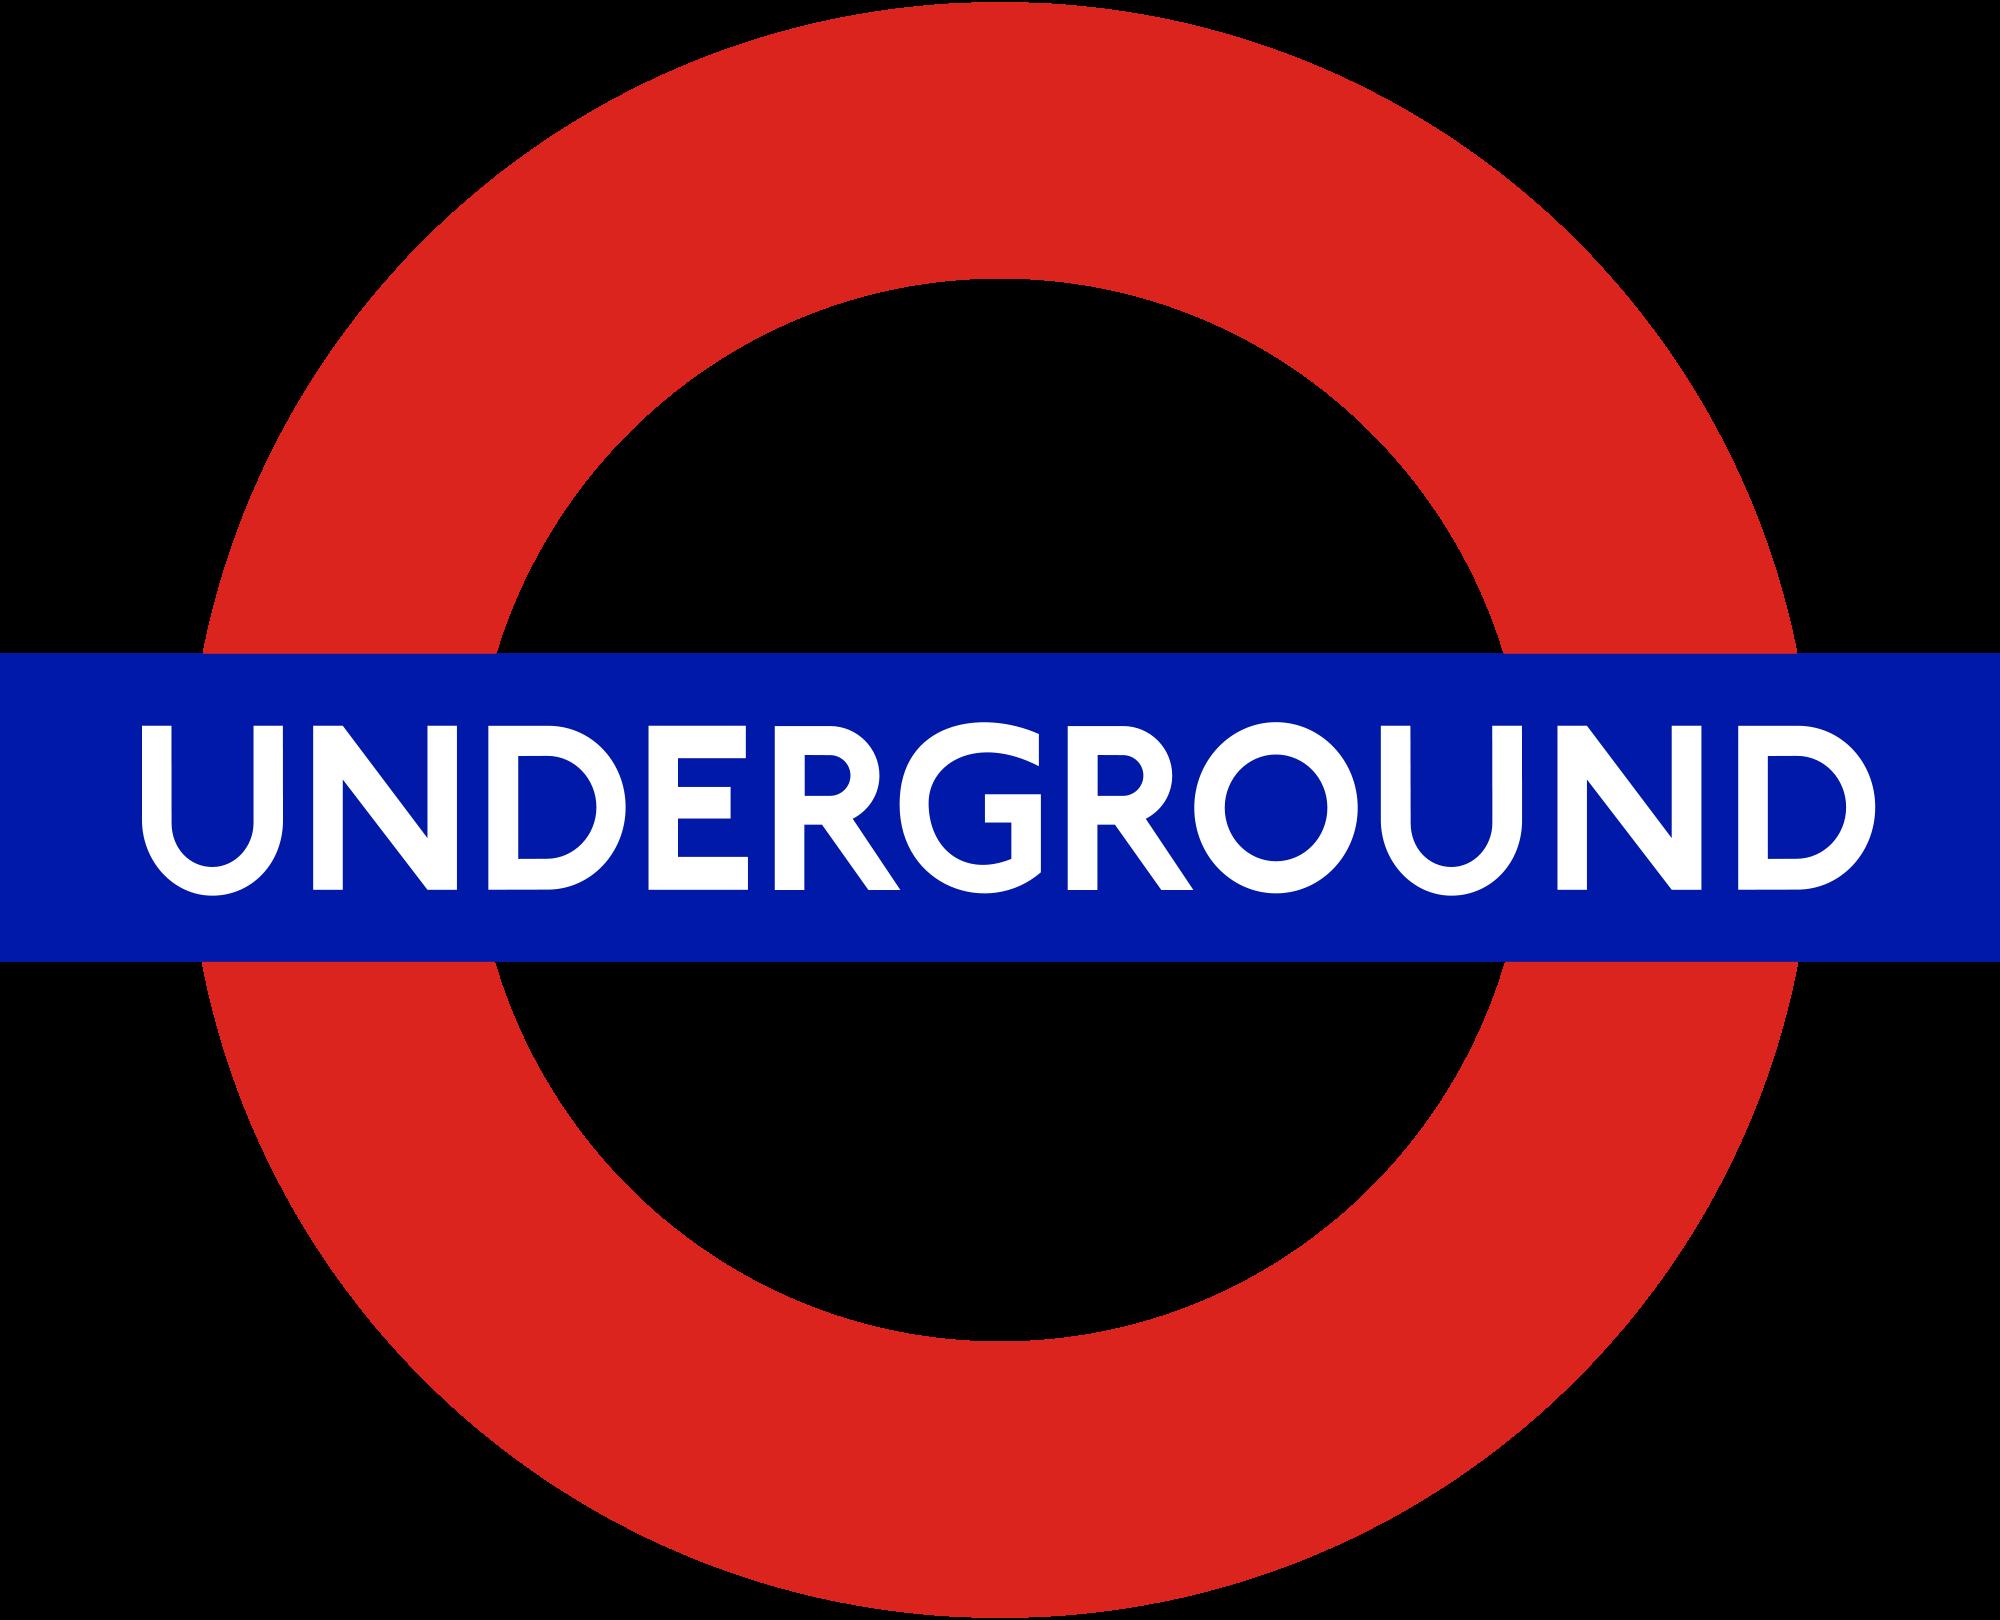 Underground clipart london england  25 Ride London 25